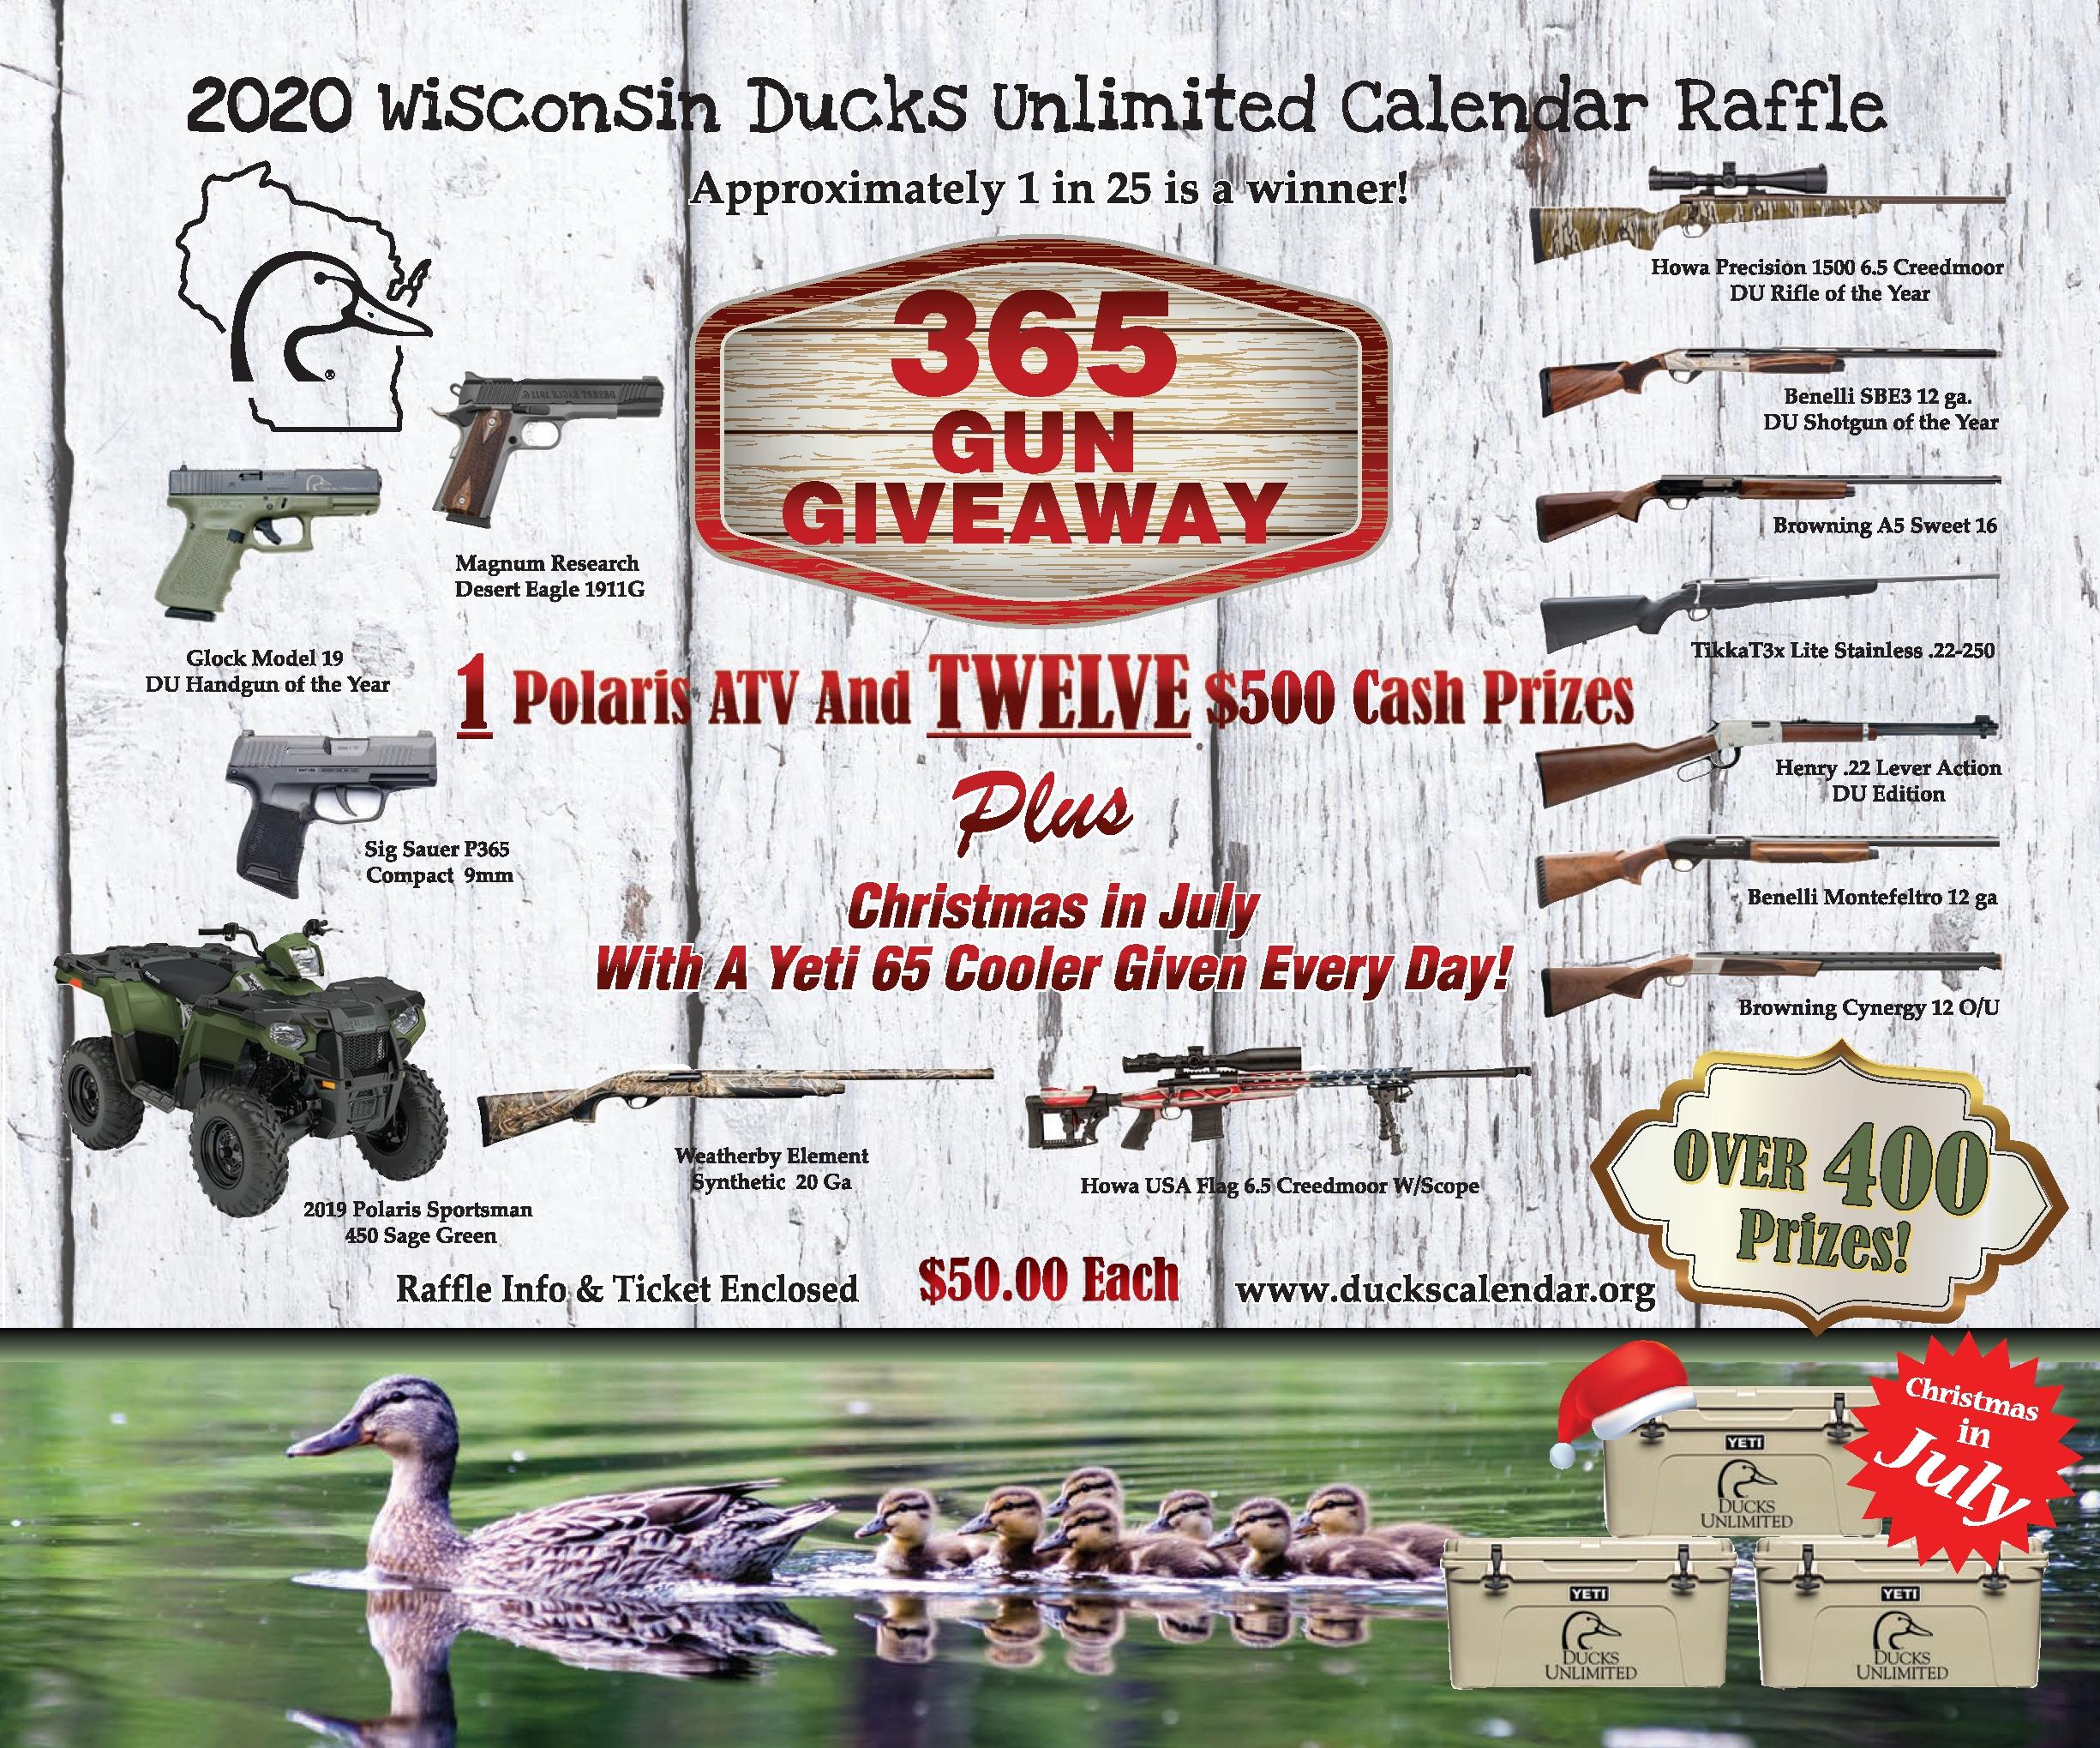 2020 Wi Du Calendars - Ducks Unlimited Calendar Raffle